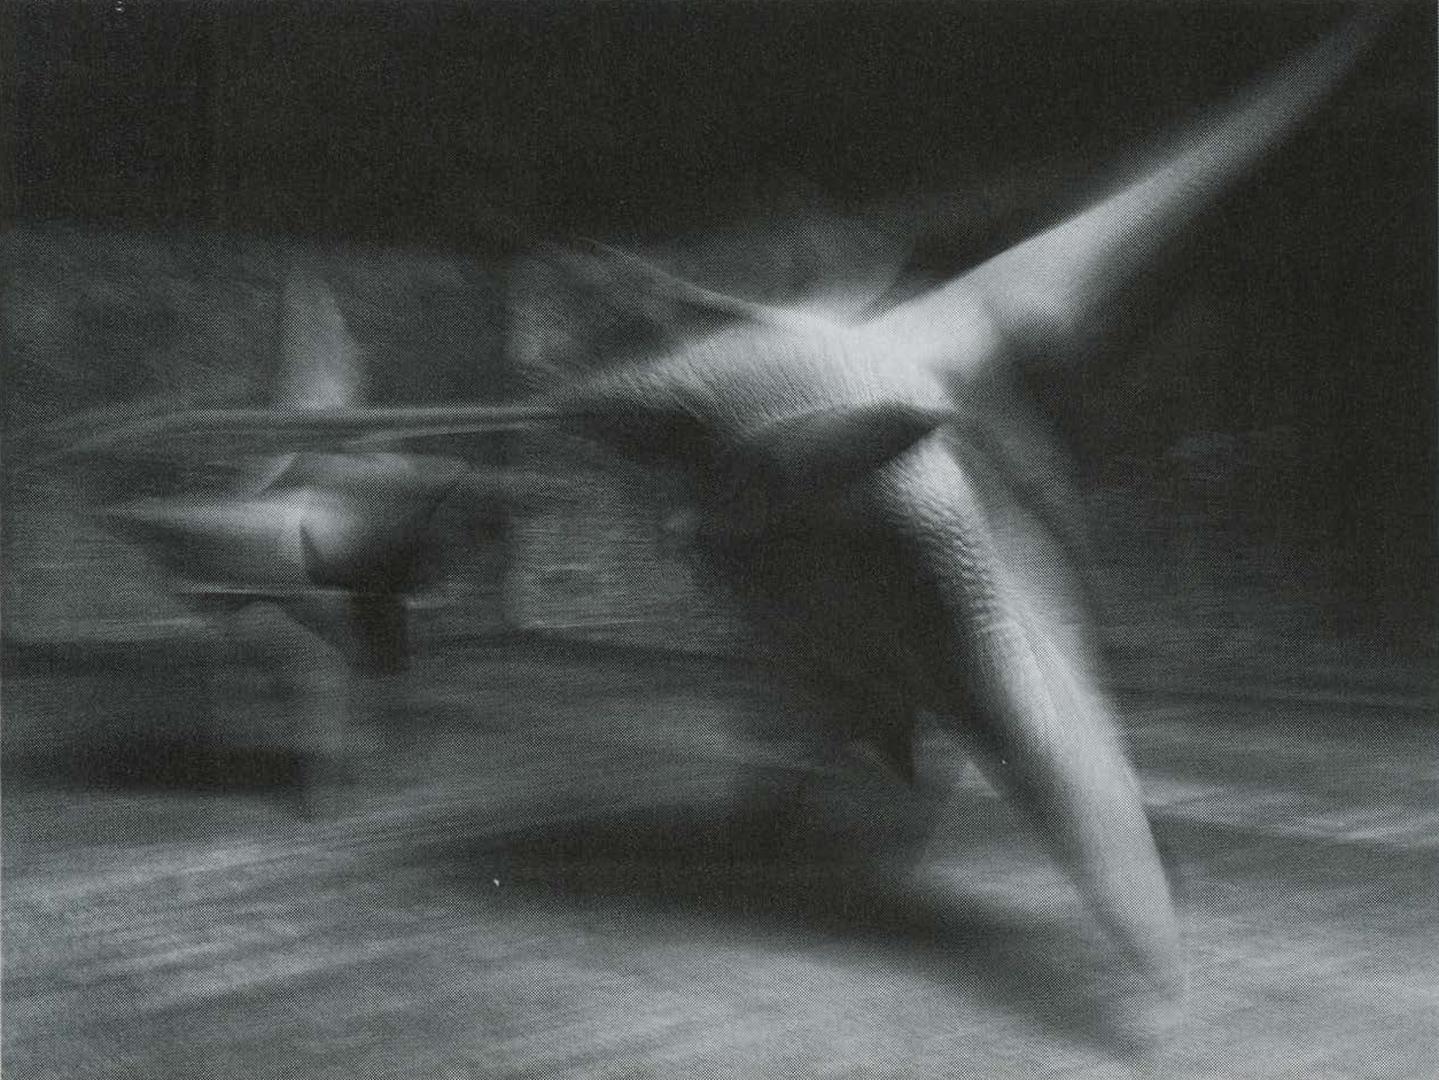 ©2004, Alain Bittler